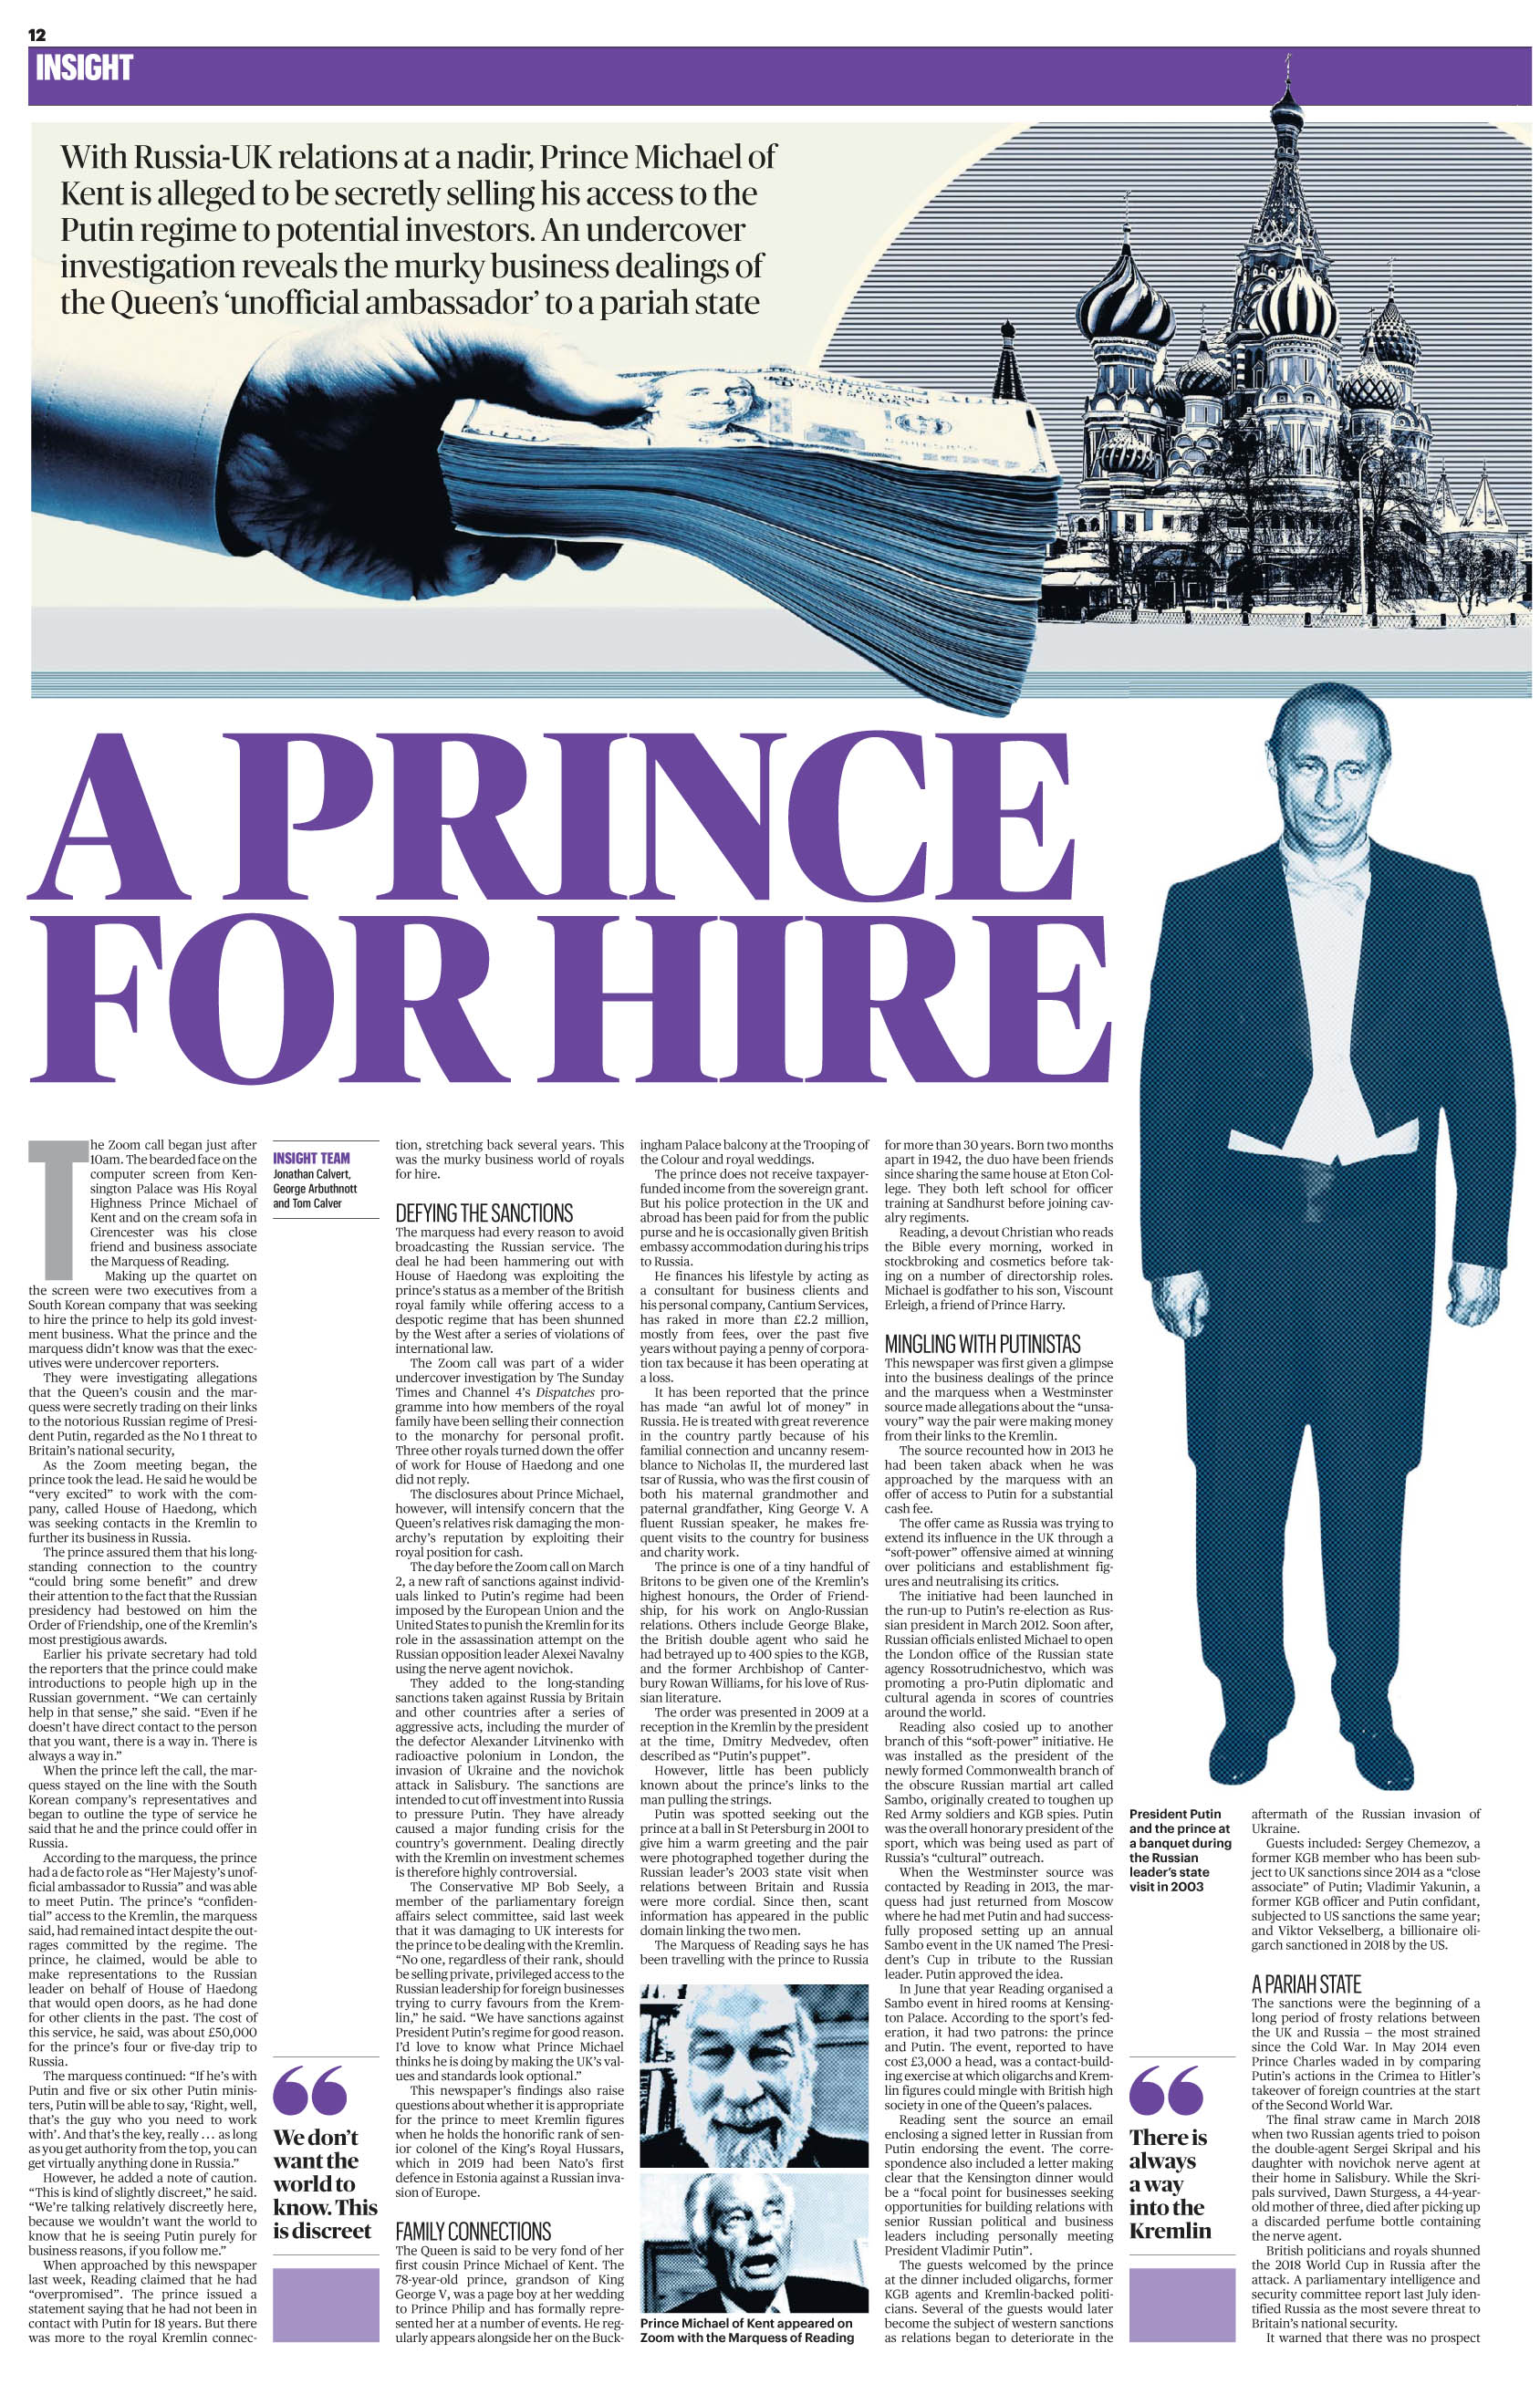 Times 210509 Prince Michael 02.jpg